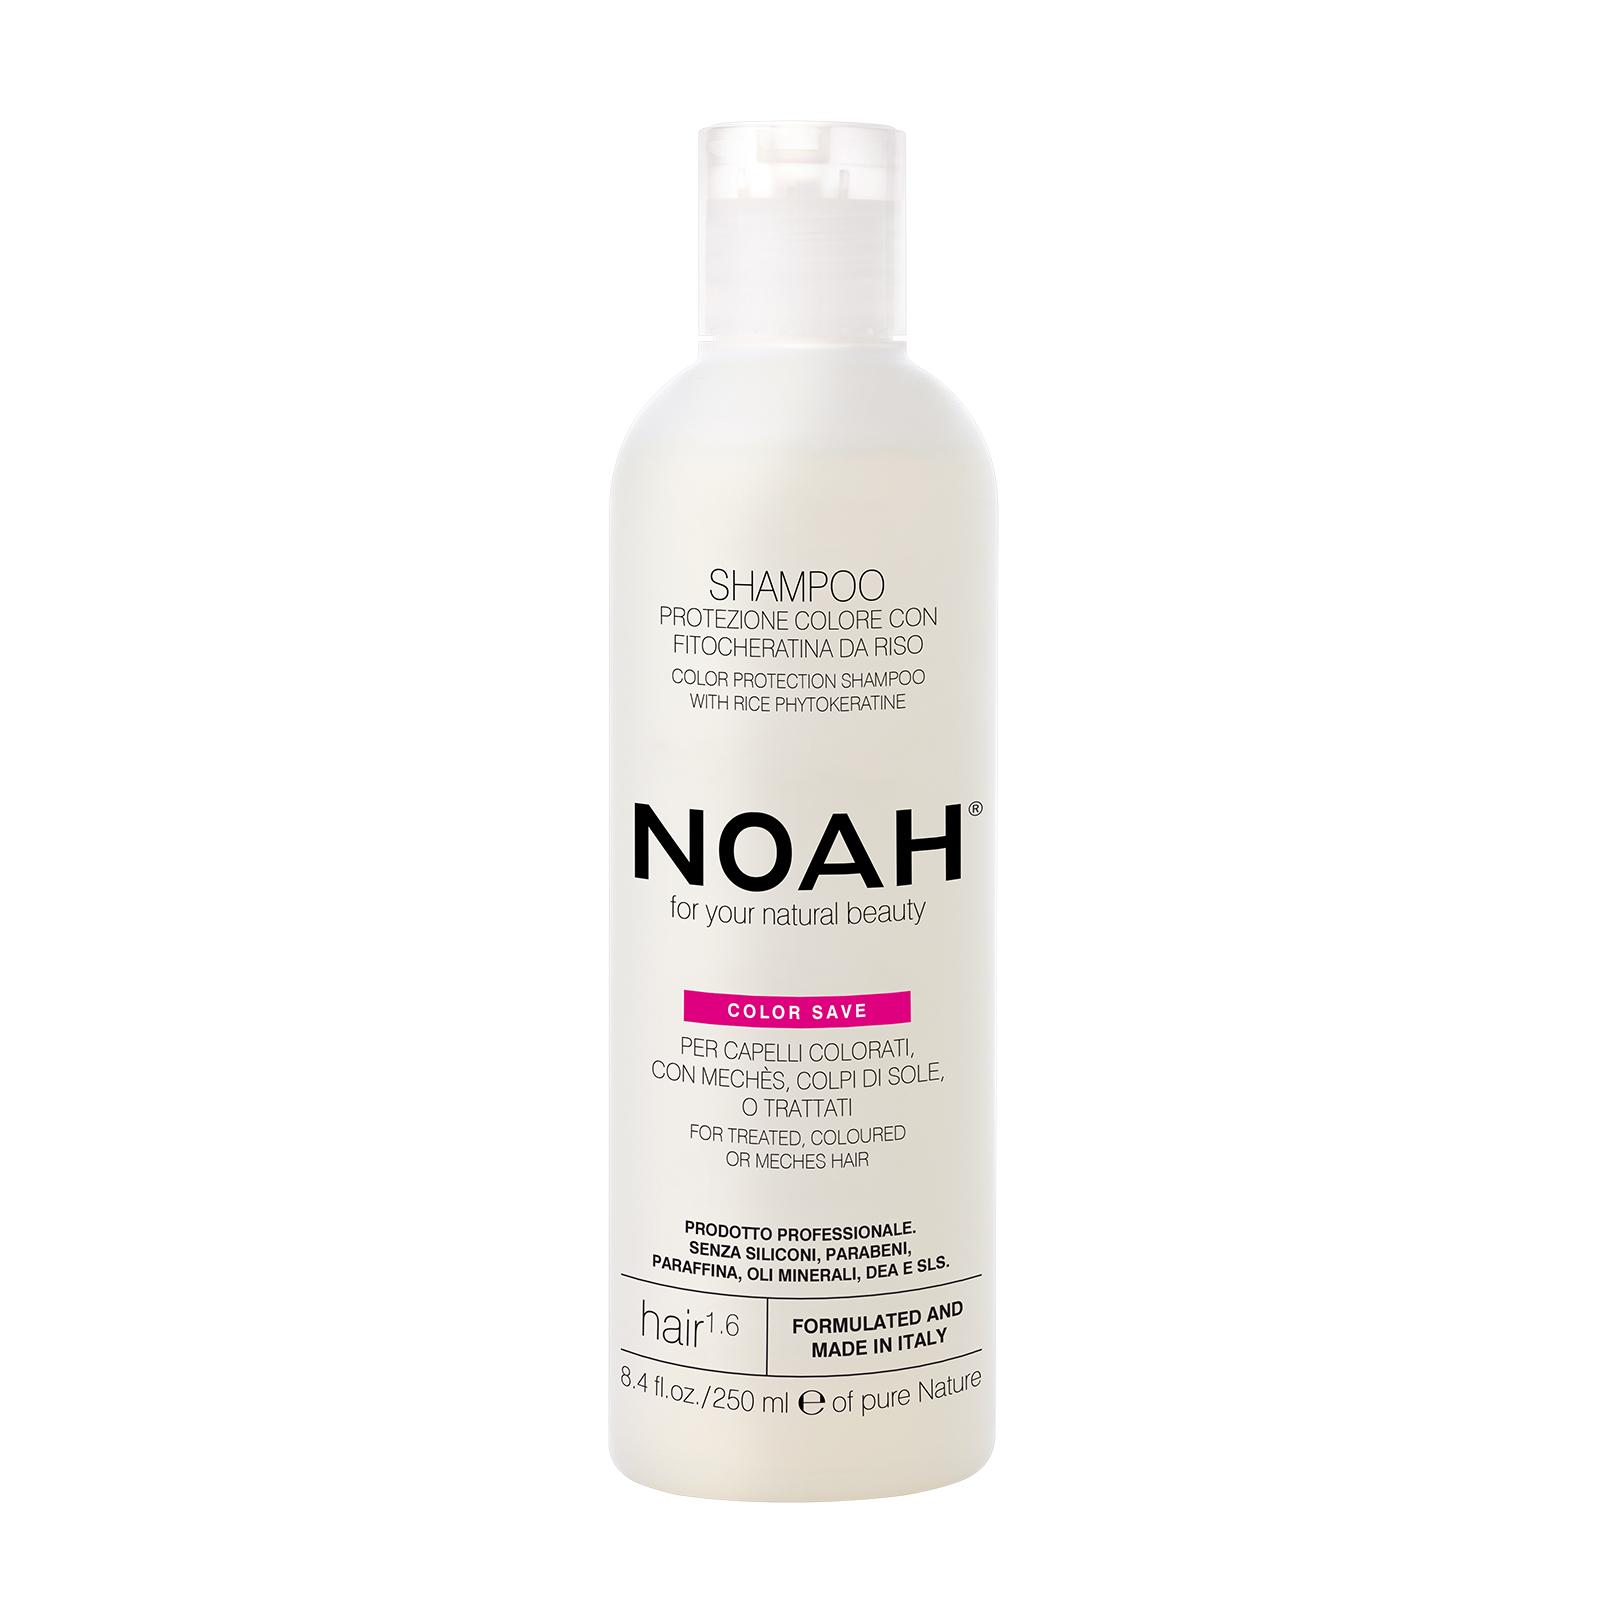 Shampoo Noah Per Capelli Colorati Con Mechès Colpi Di Sole